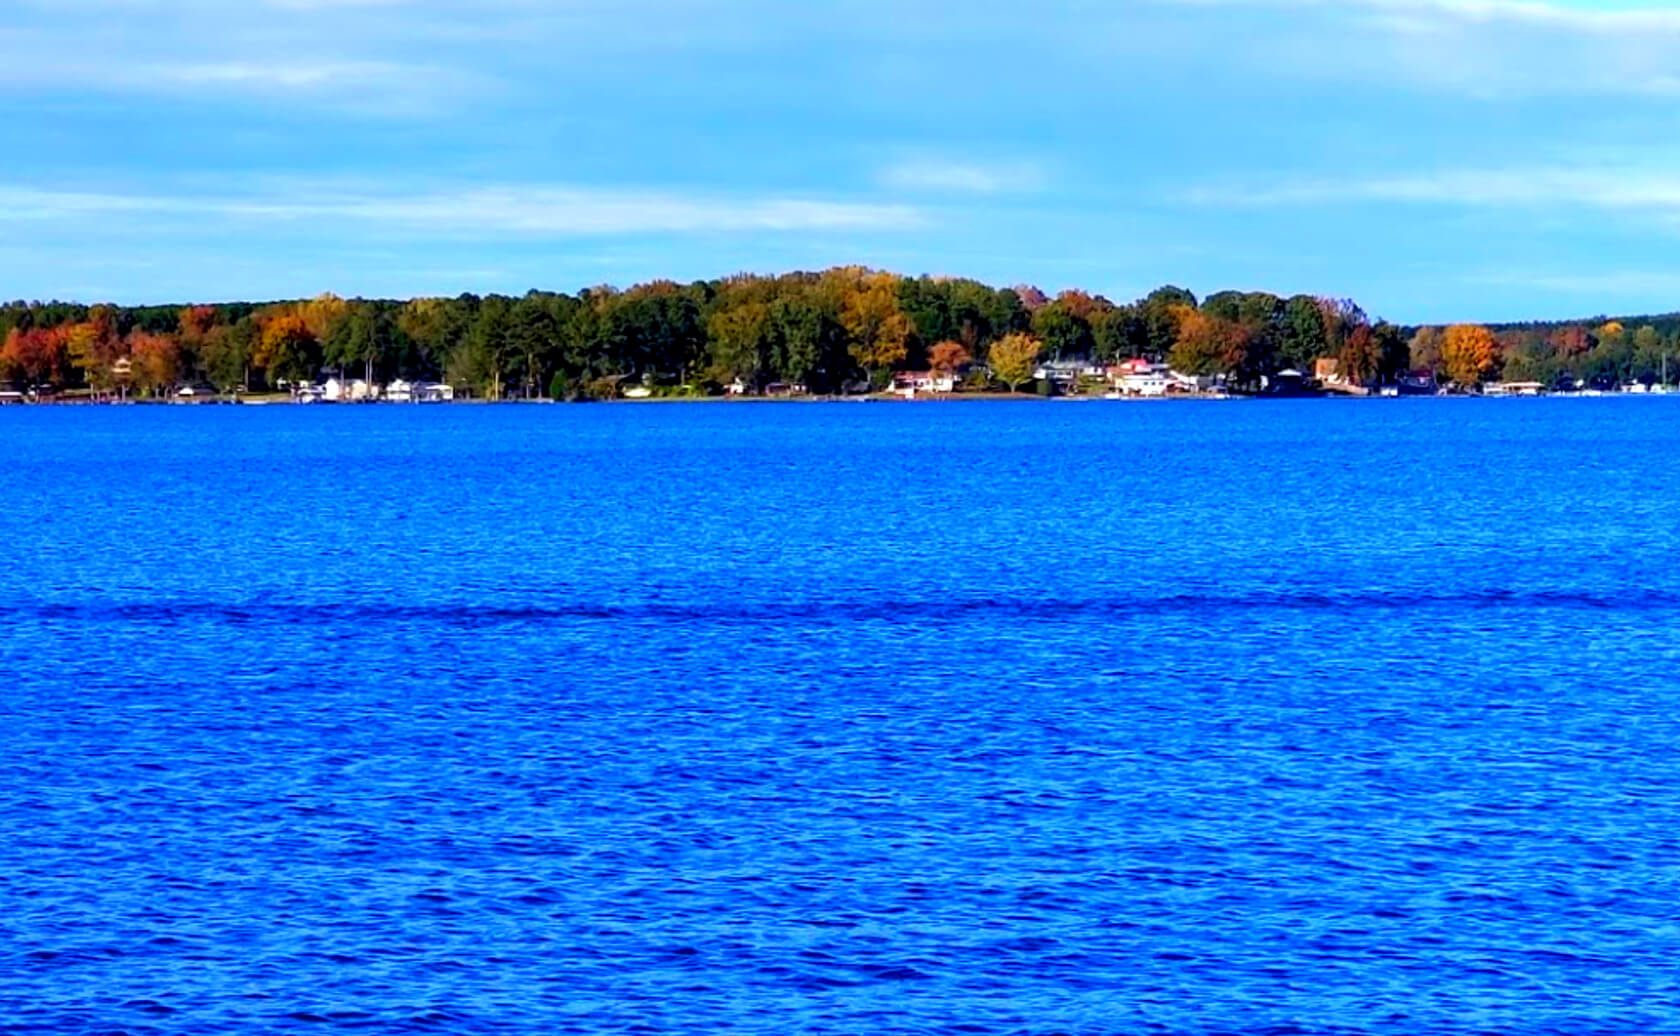 Greenwood-Lake-Fishing-Guide-Report-South-Carolina-01